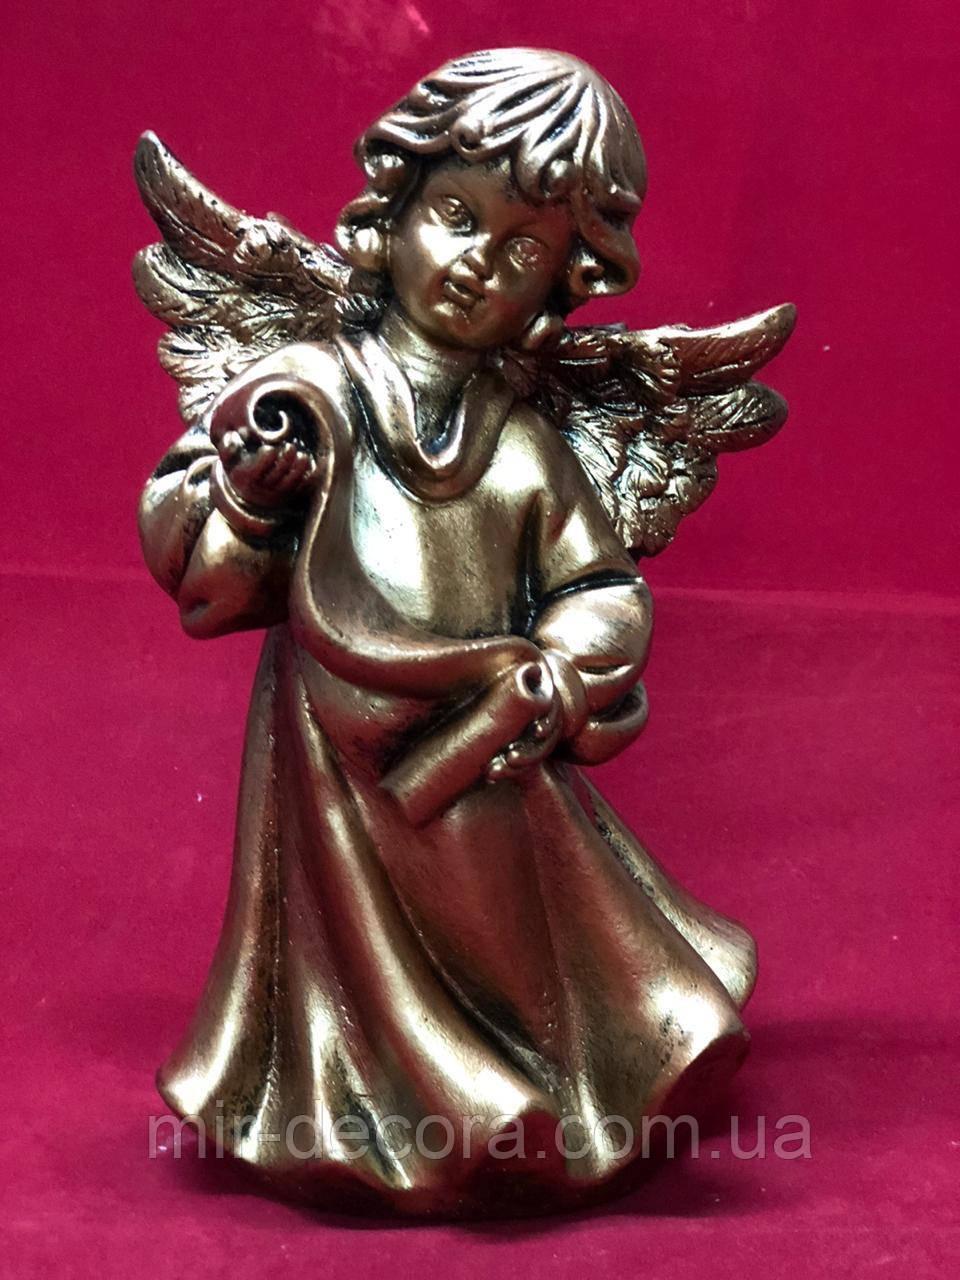 Статуэтка гипсовая фигурка Ангел, бронза, 22 см